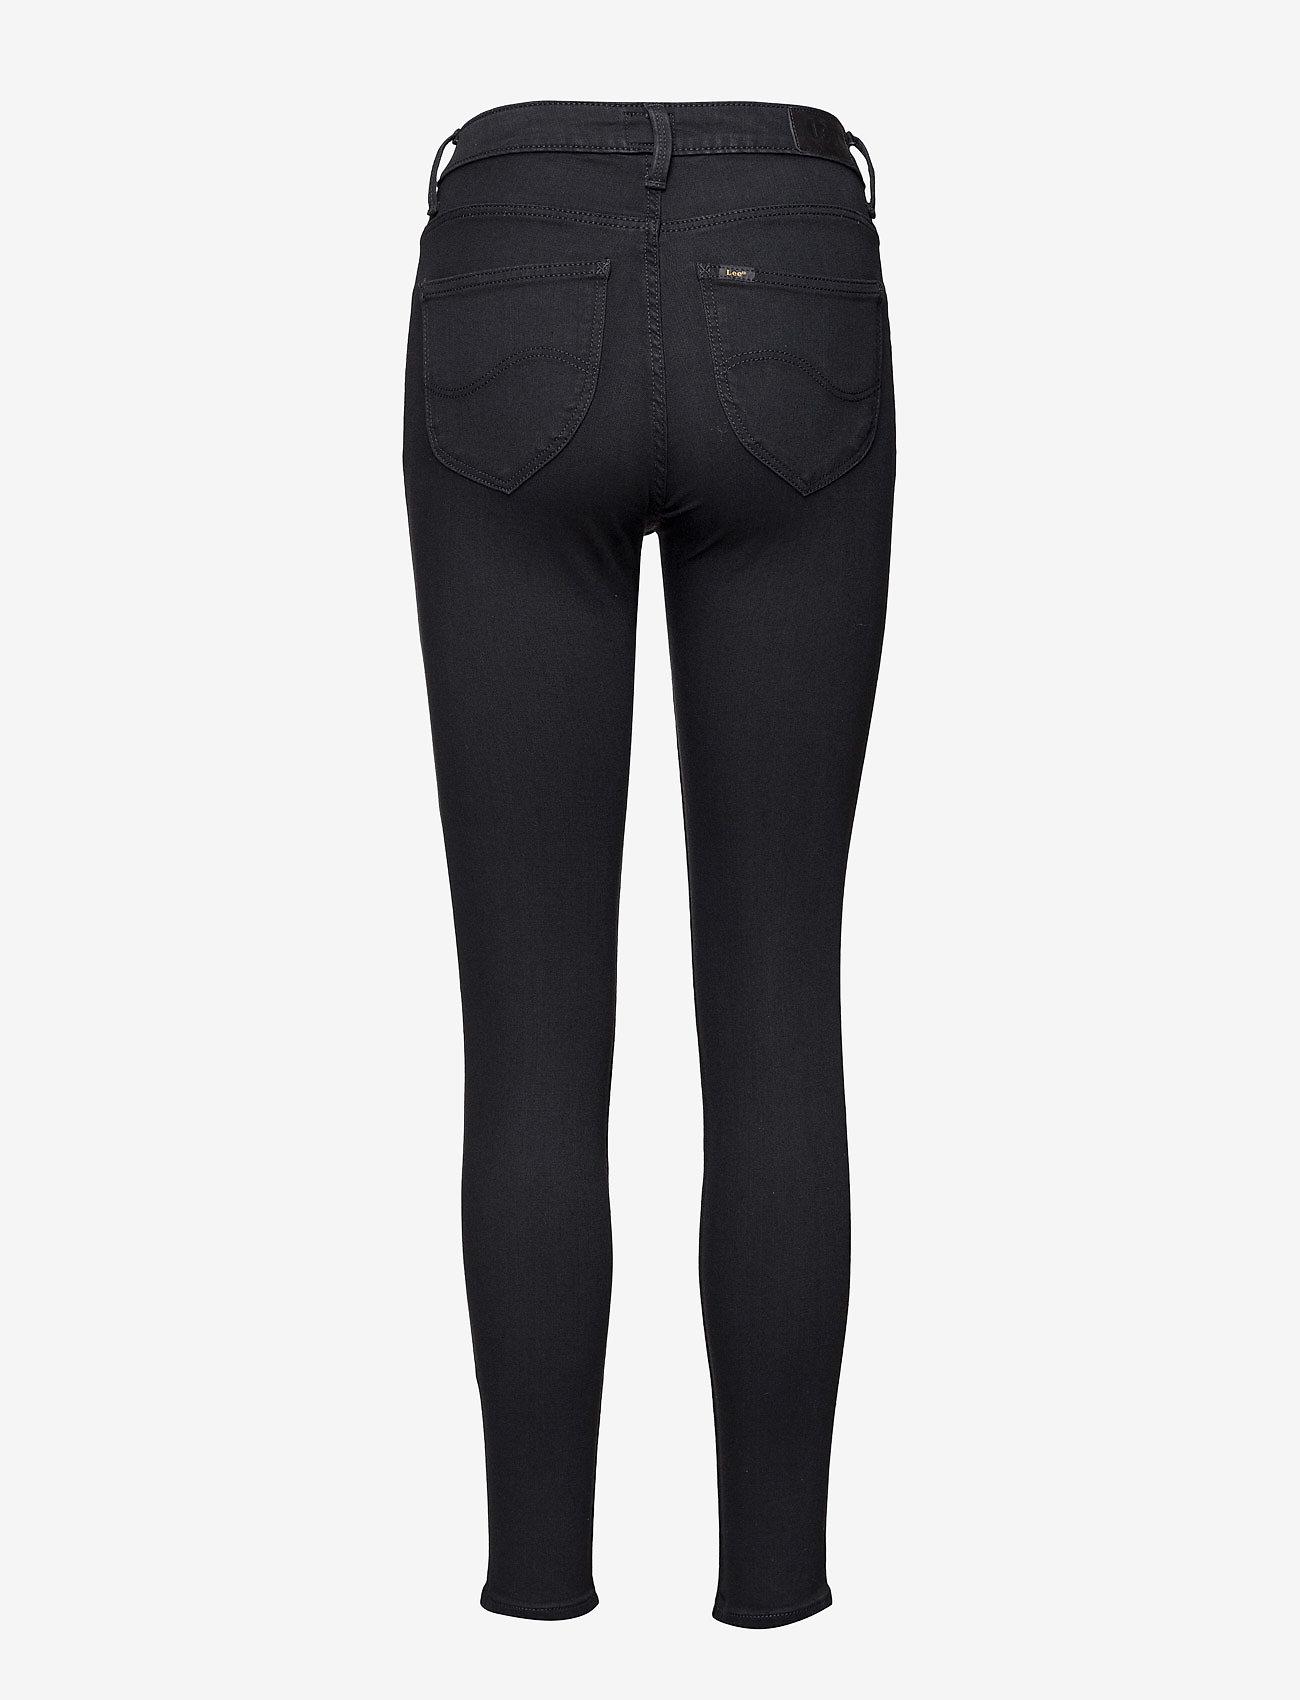 Lee Jeans - SCARLETT HIGH - skinny jeans - black rinse - 2